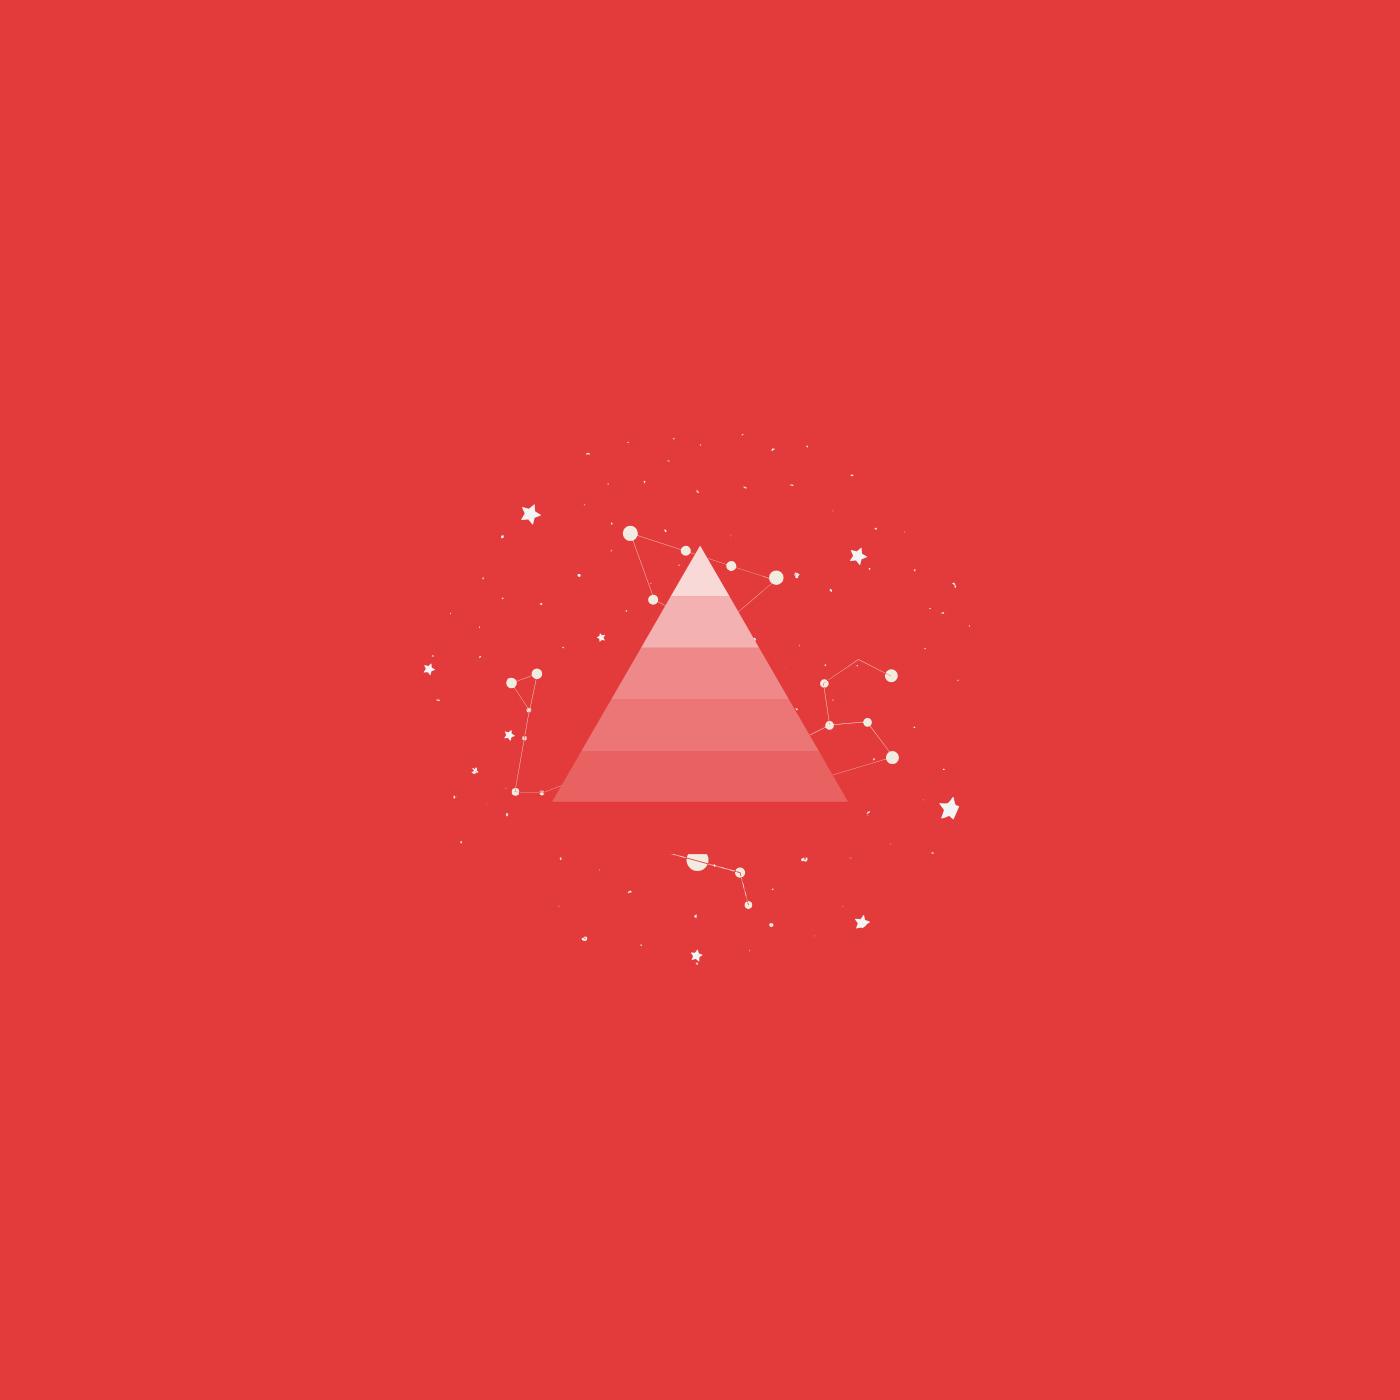 Let The Game Begin Https Www Reddottrader Com In 2020 Art Red Dots Poster